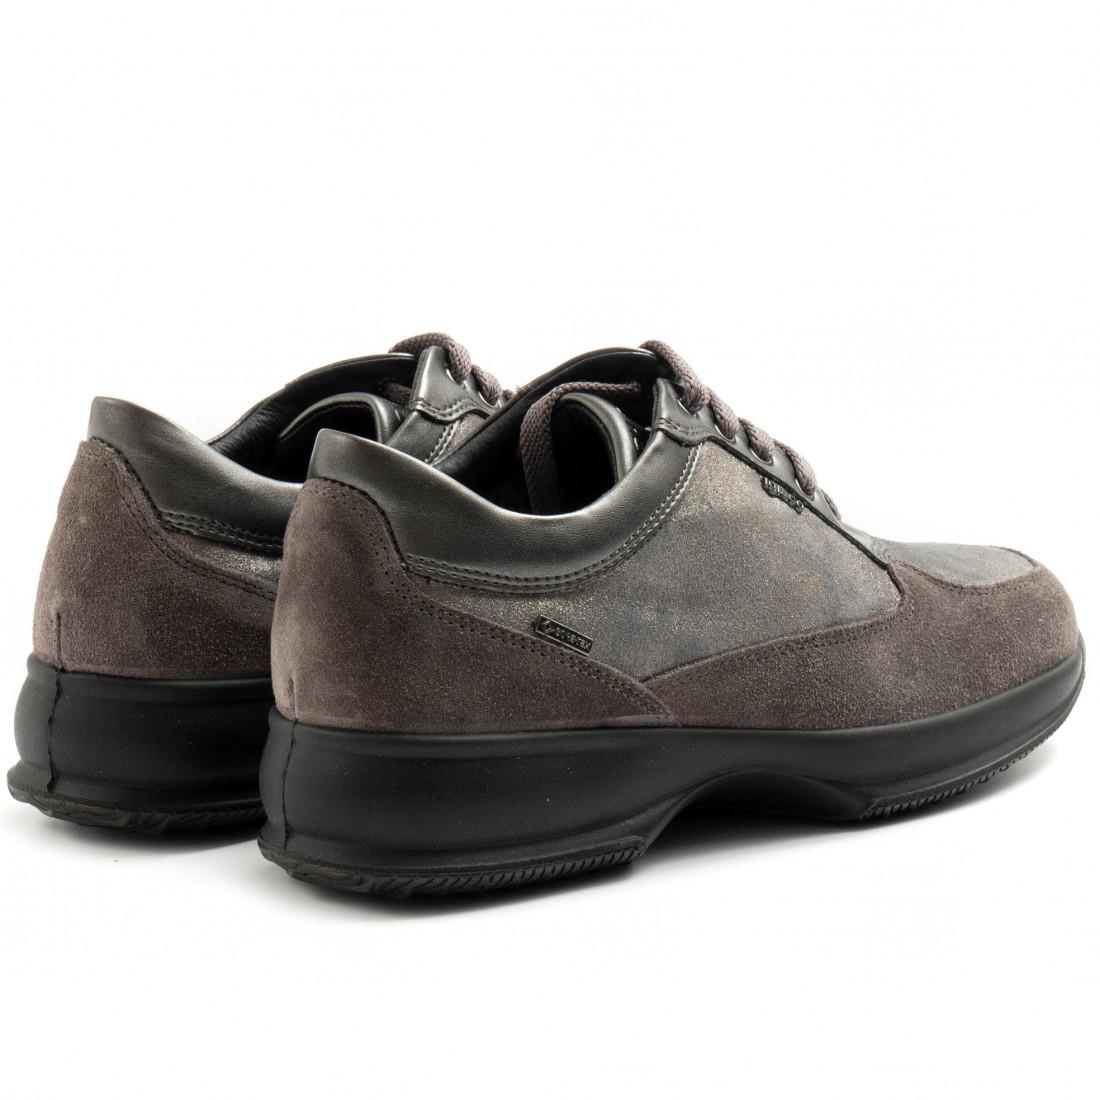 sneakers damen igico flex6163822 7821